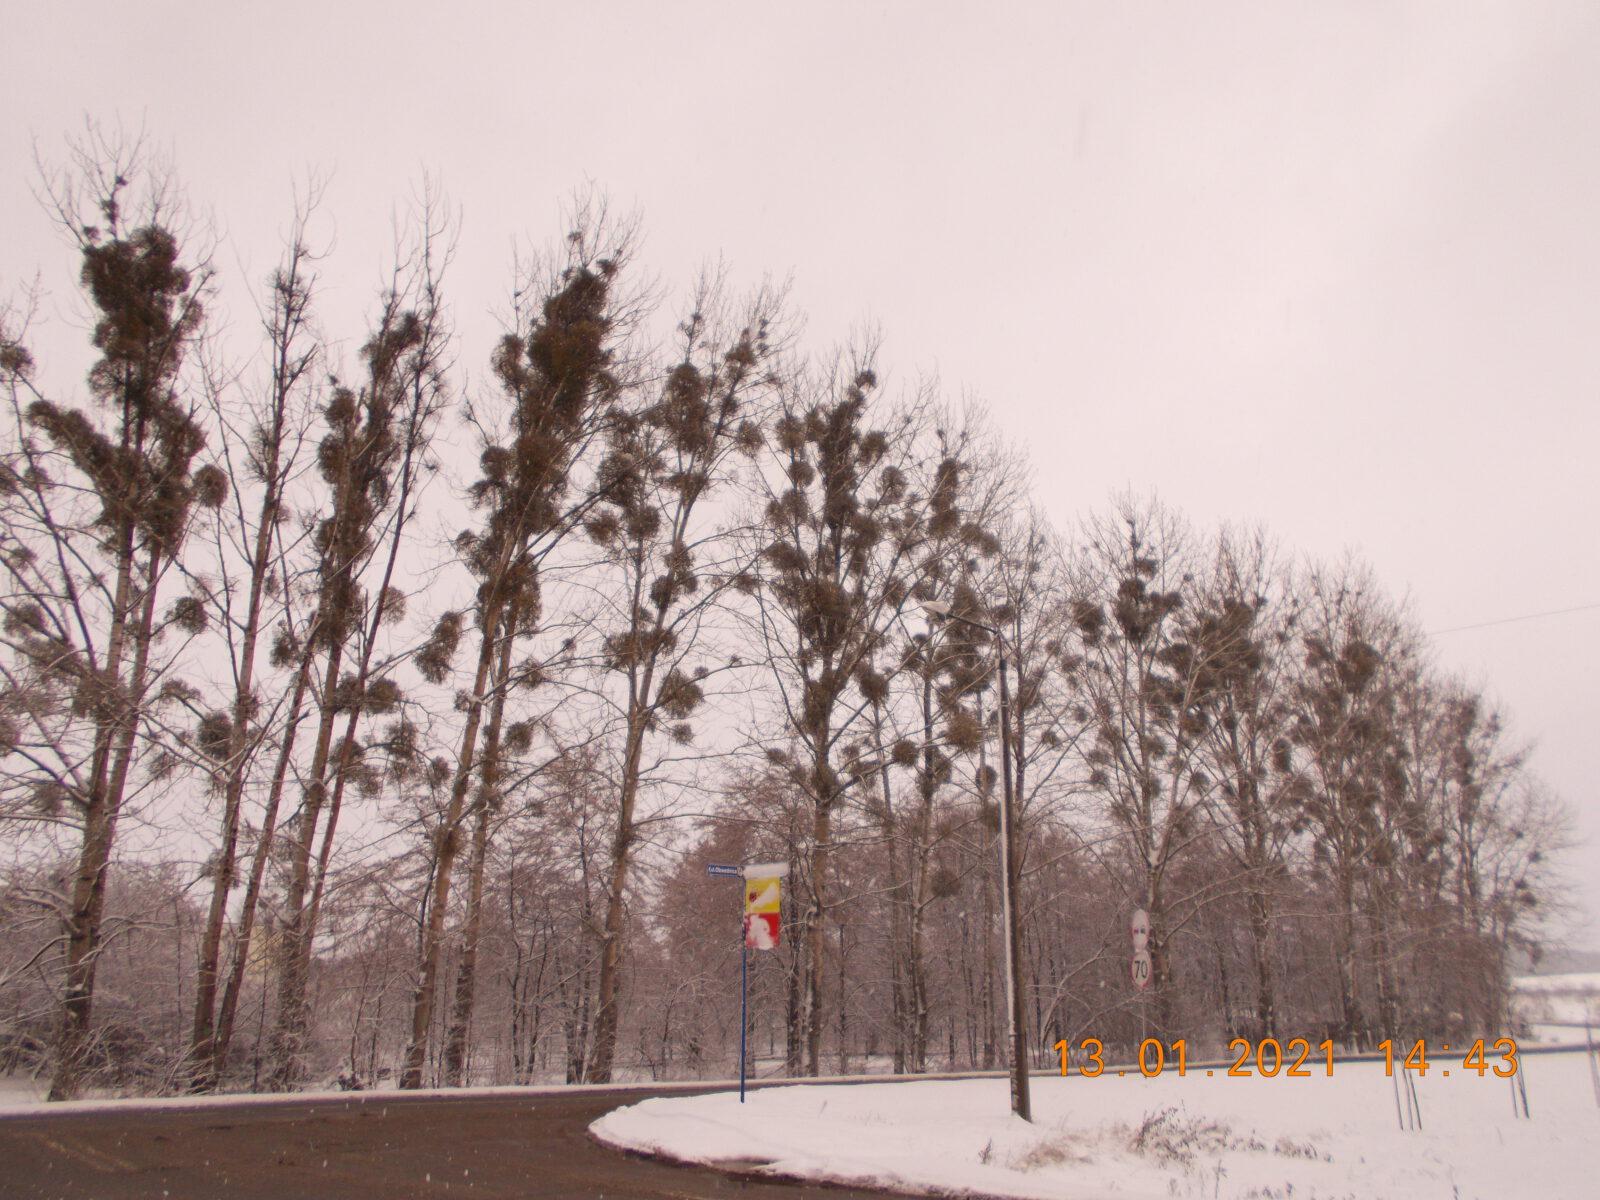 Zimowa sceneria. Śnieg, drzewa